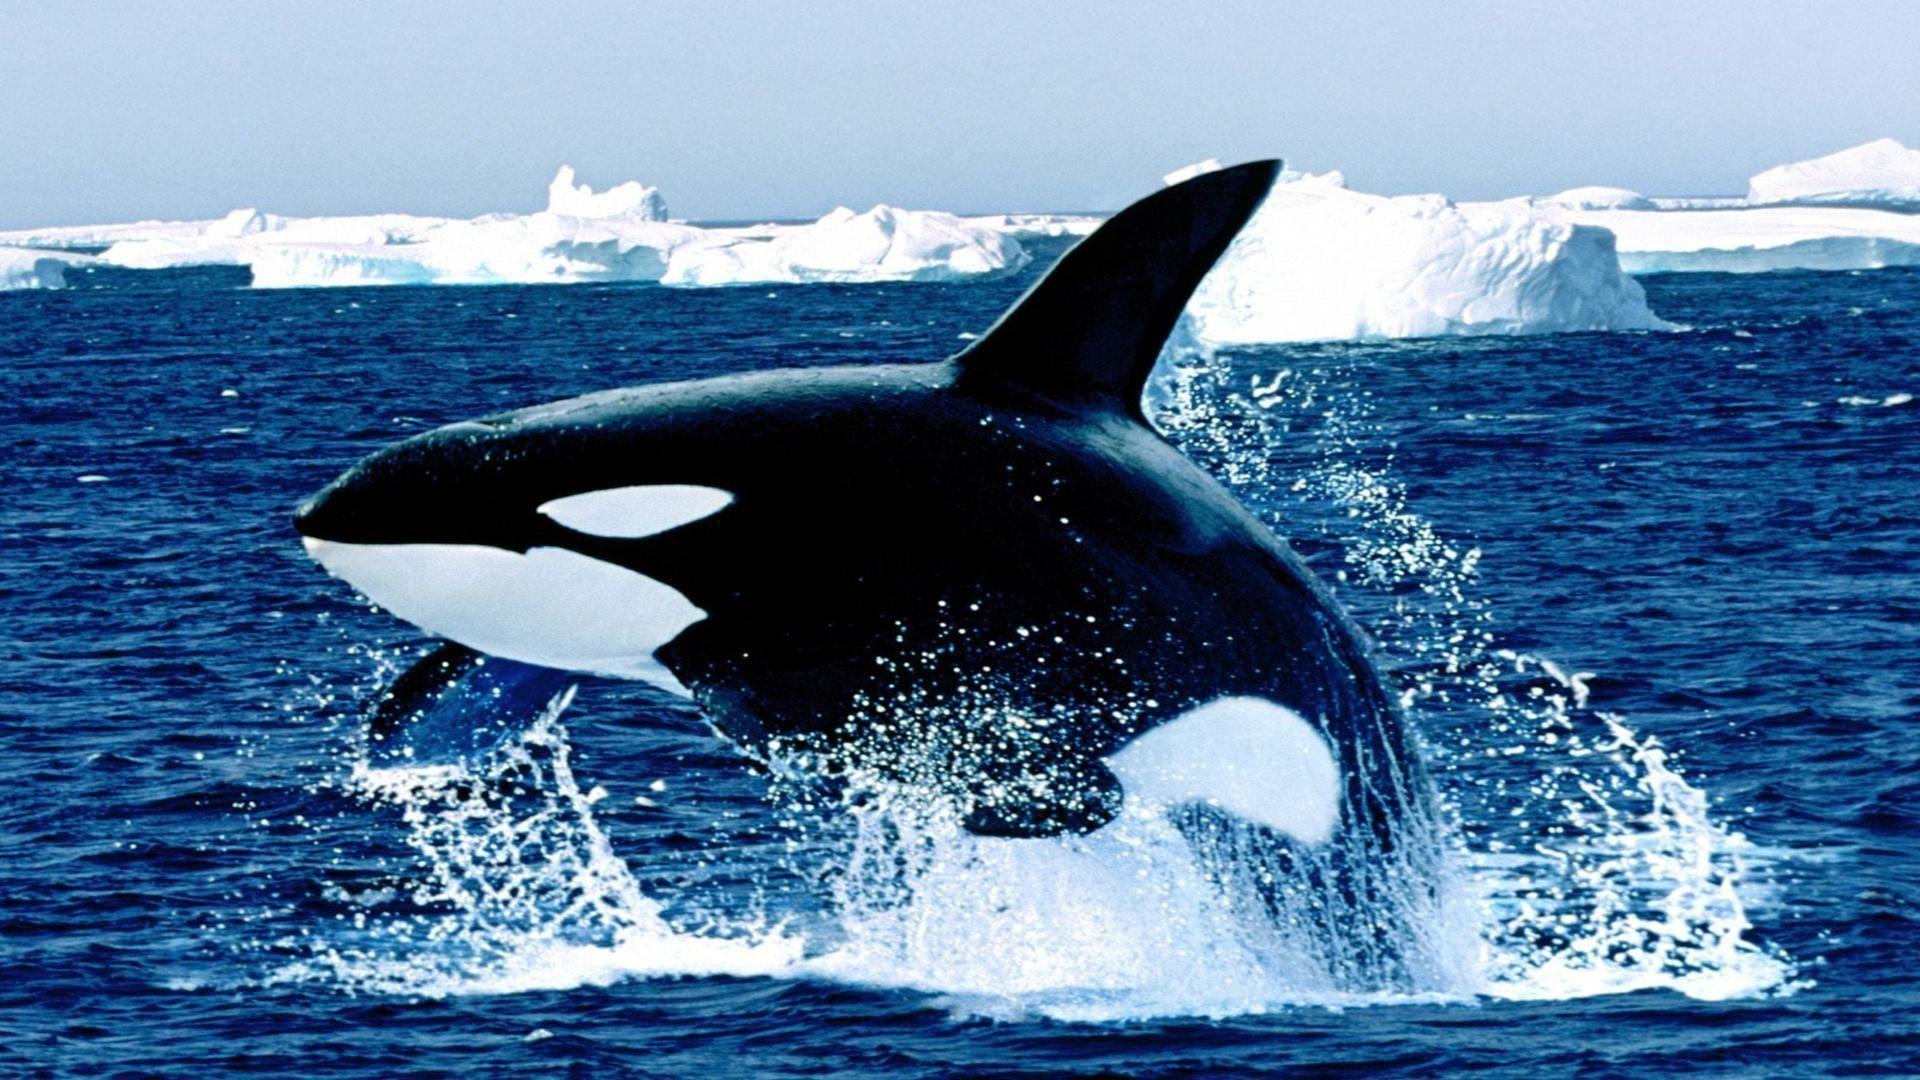 Res: 1920x1080, Emerging killer whale free desktop background - free wallpaper image